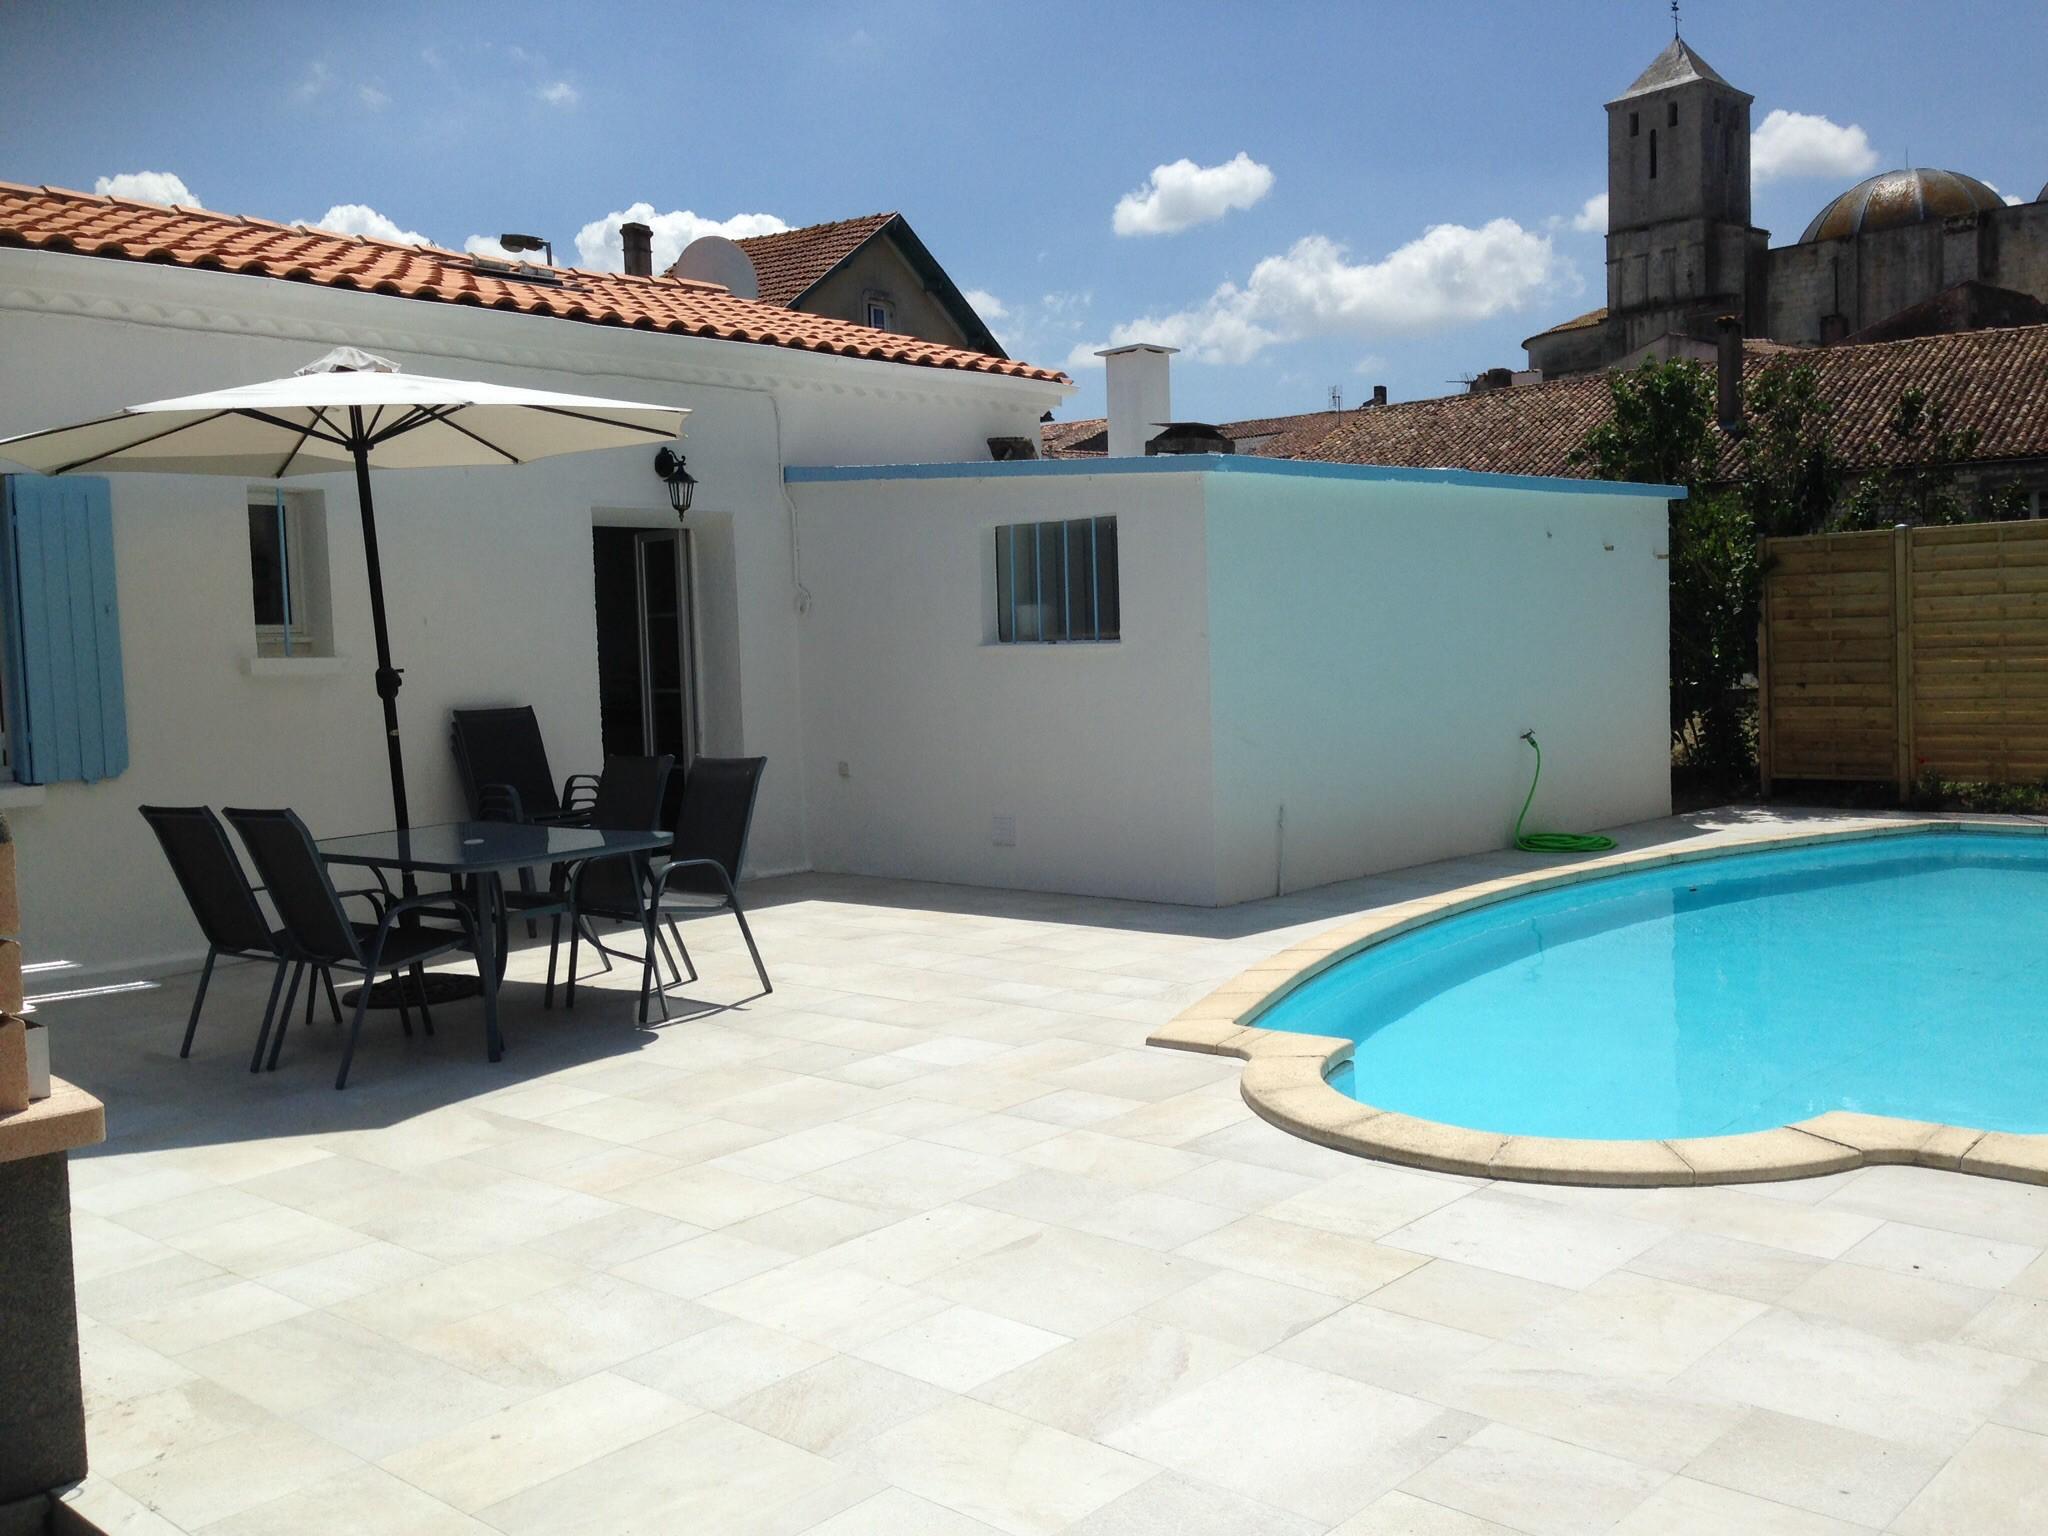 location maison 2 personnes avec piscine privee